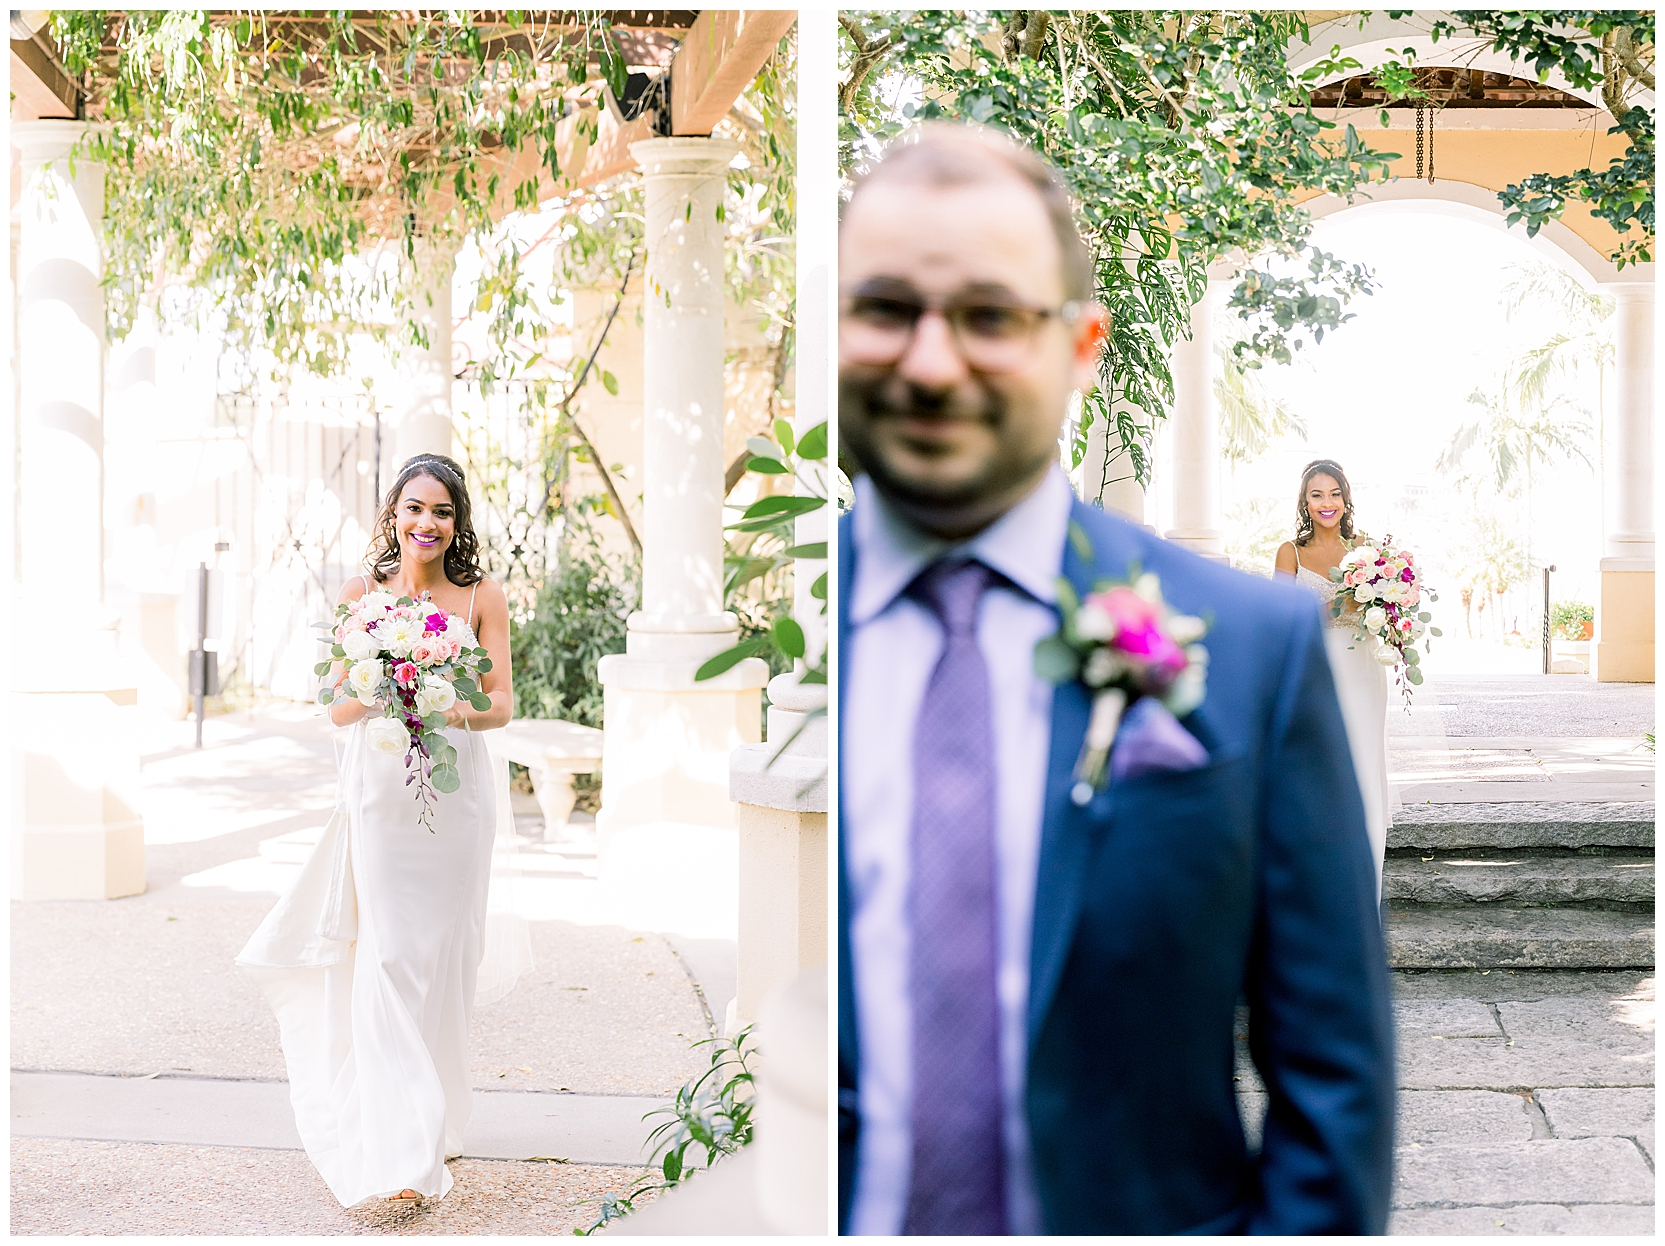 jessicafredericks_lakeland_tampa_wedding_purple_crazy hour_0015.jpg